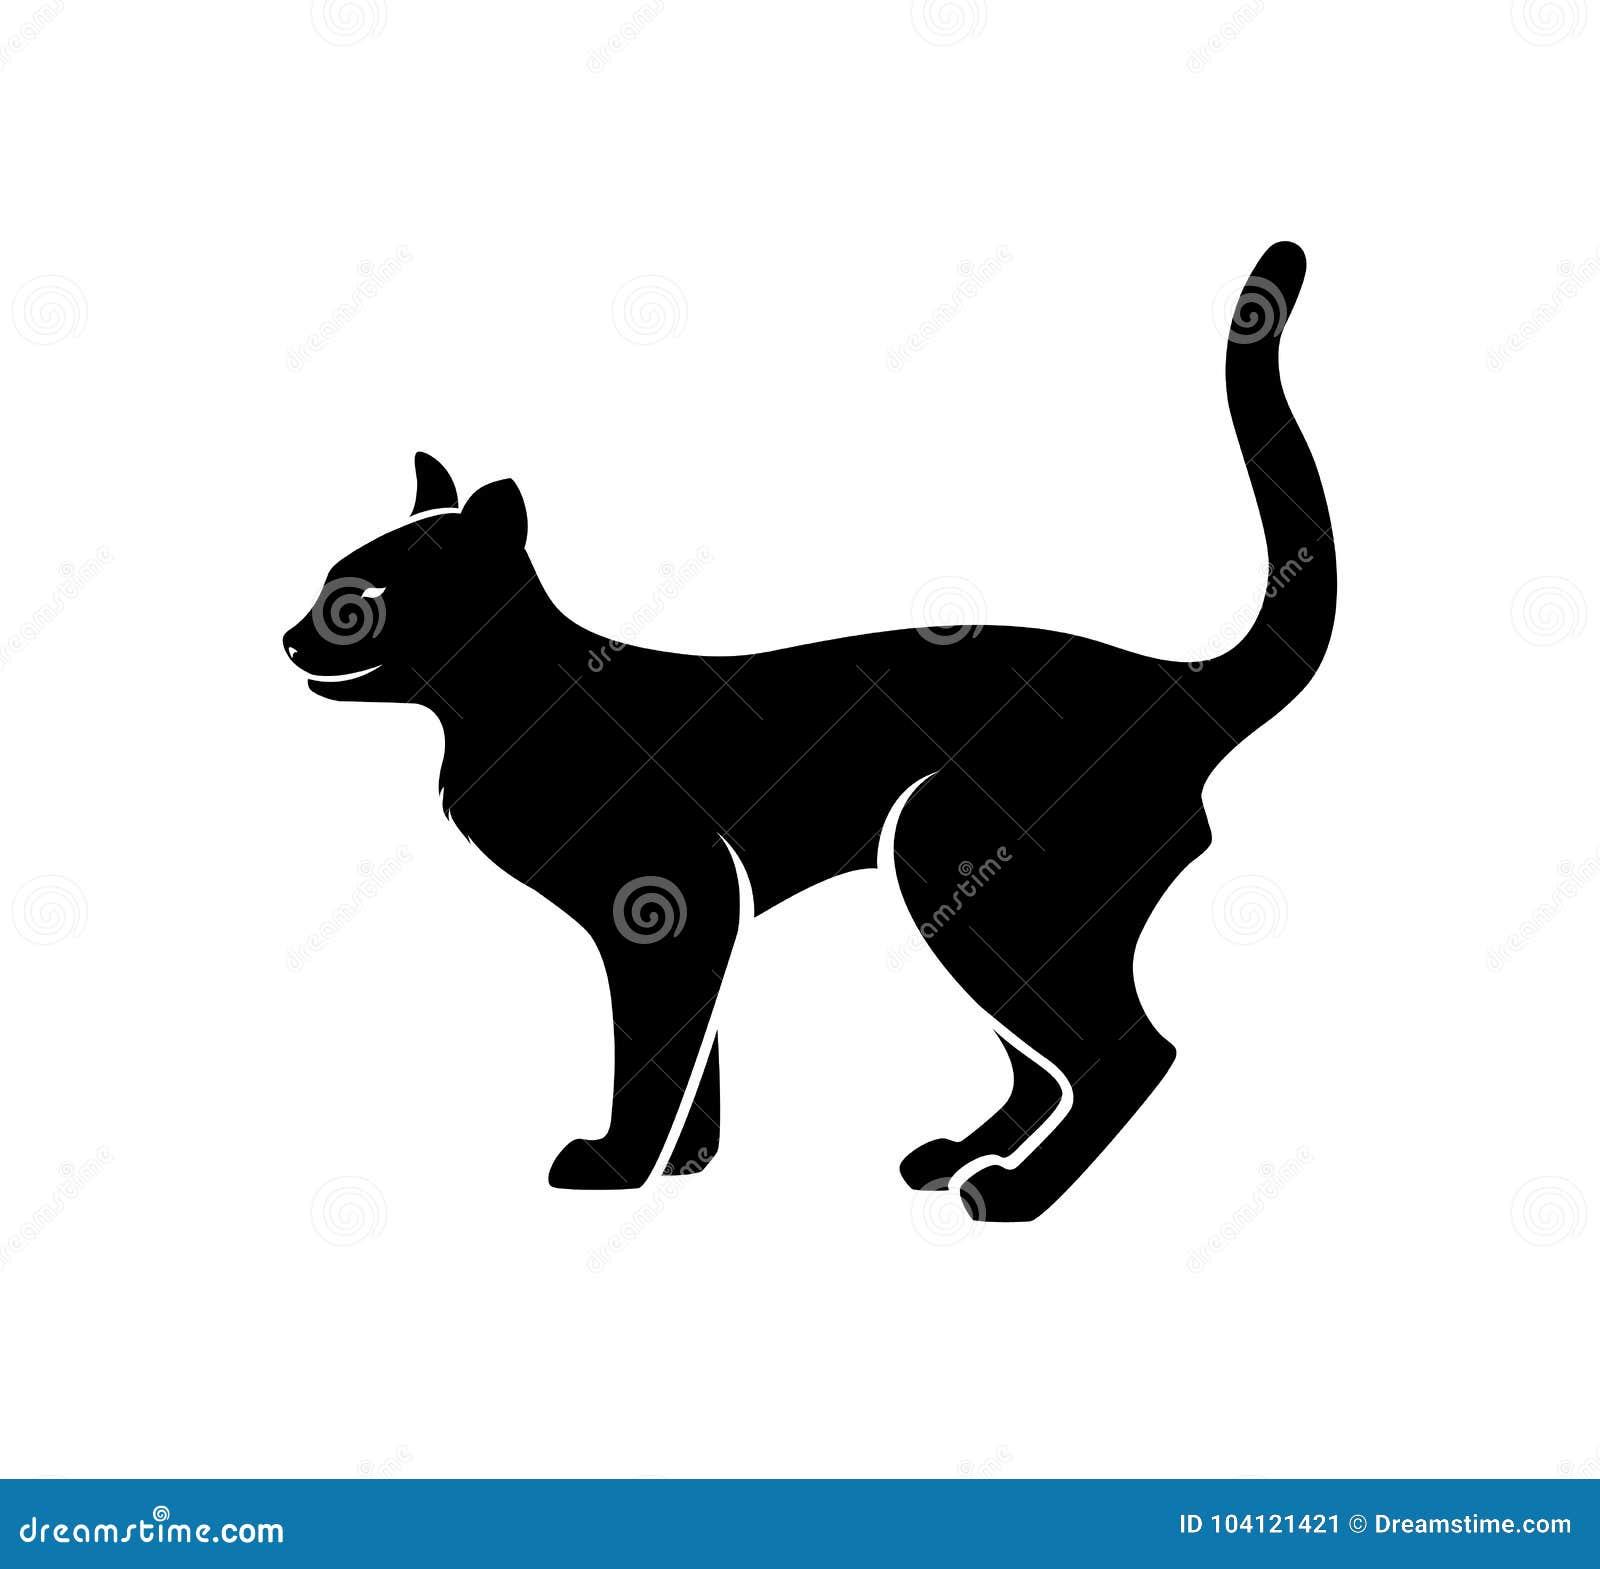 Cat Silhouette Vector selvaggia